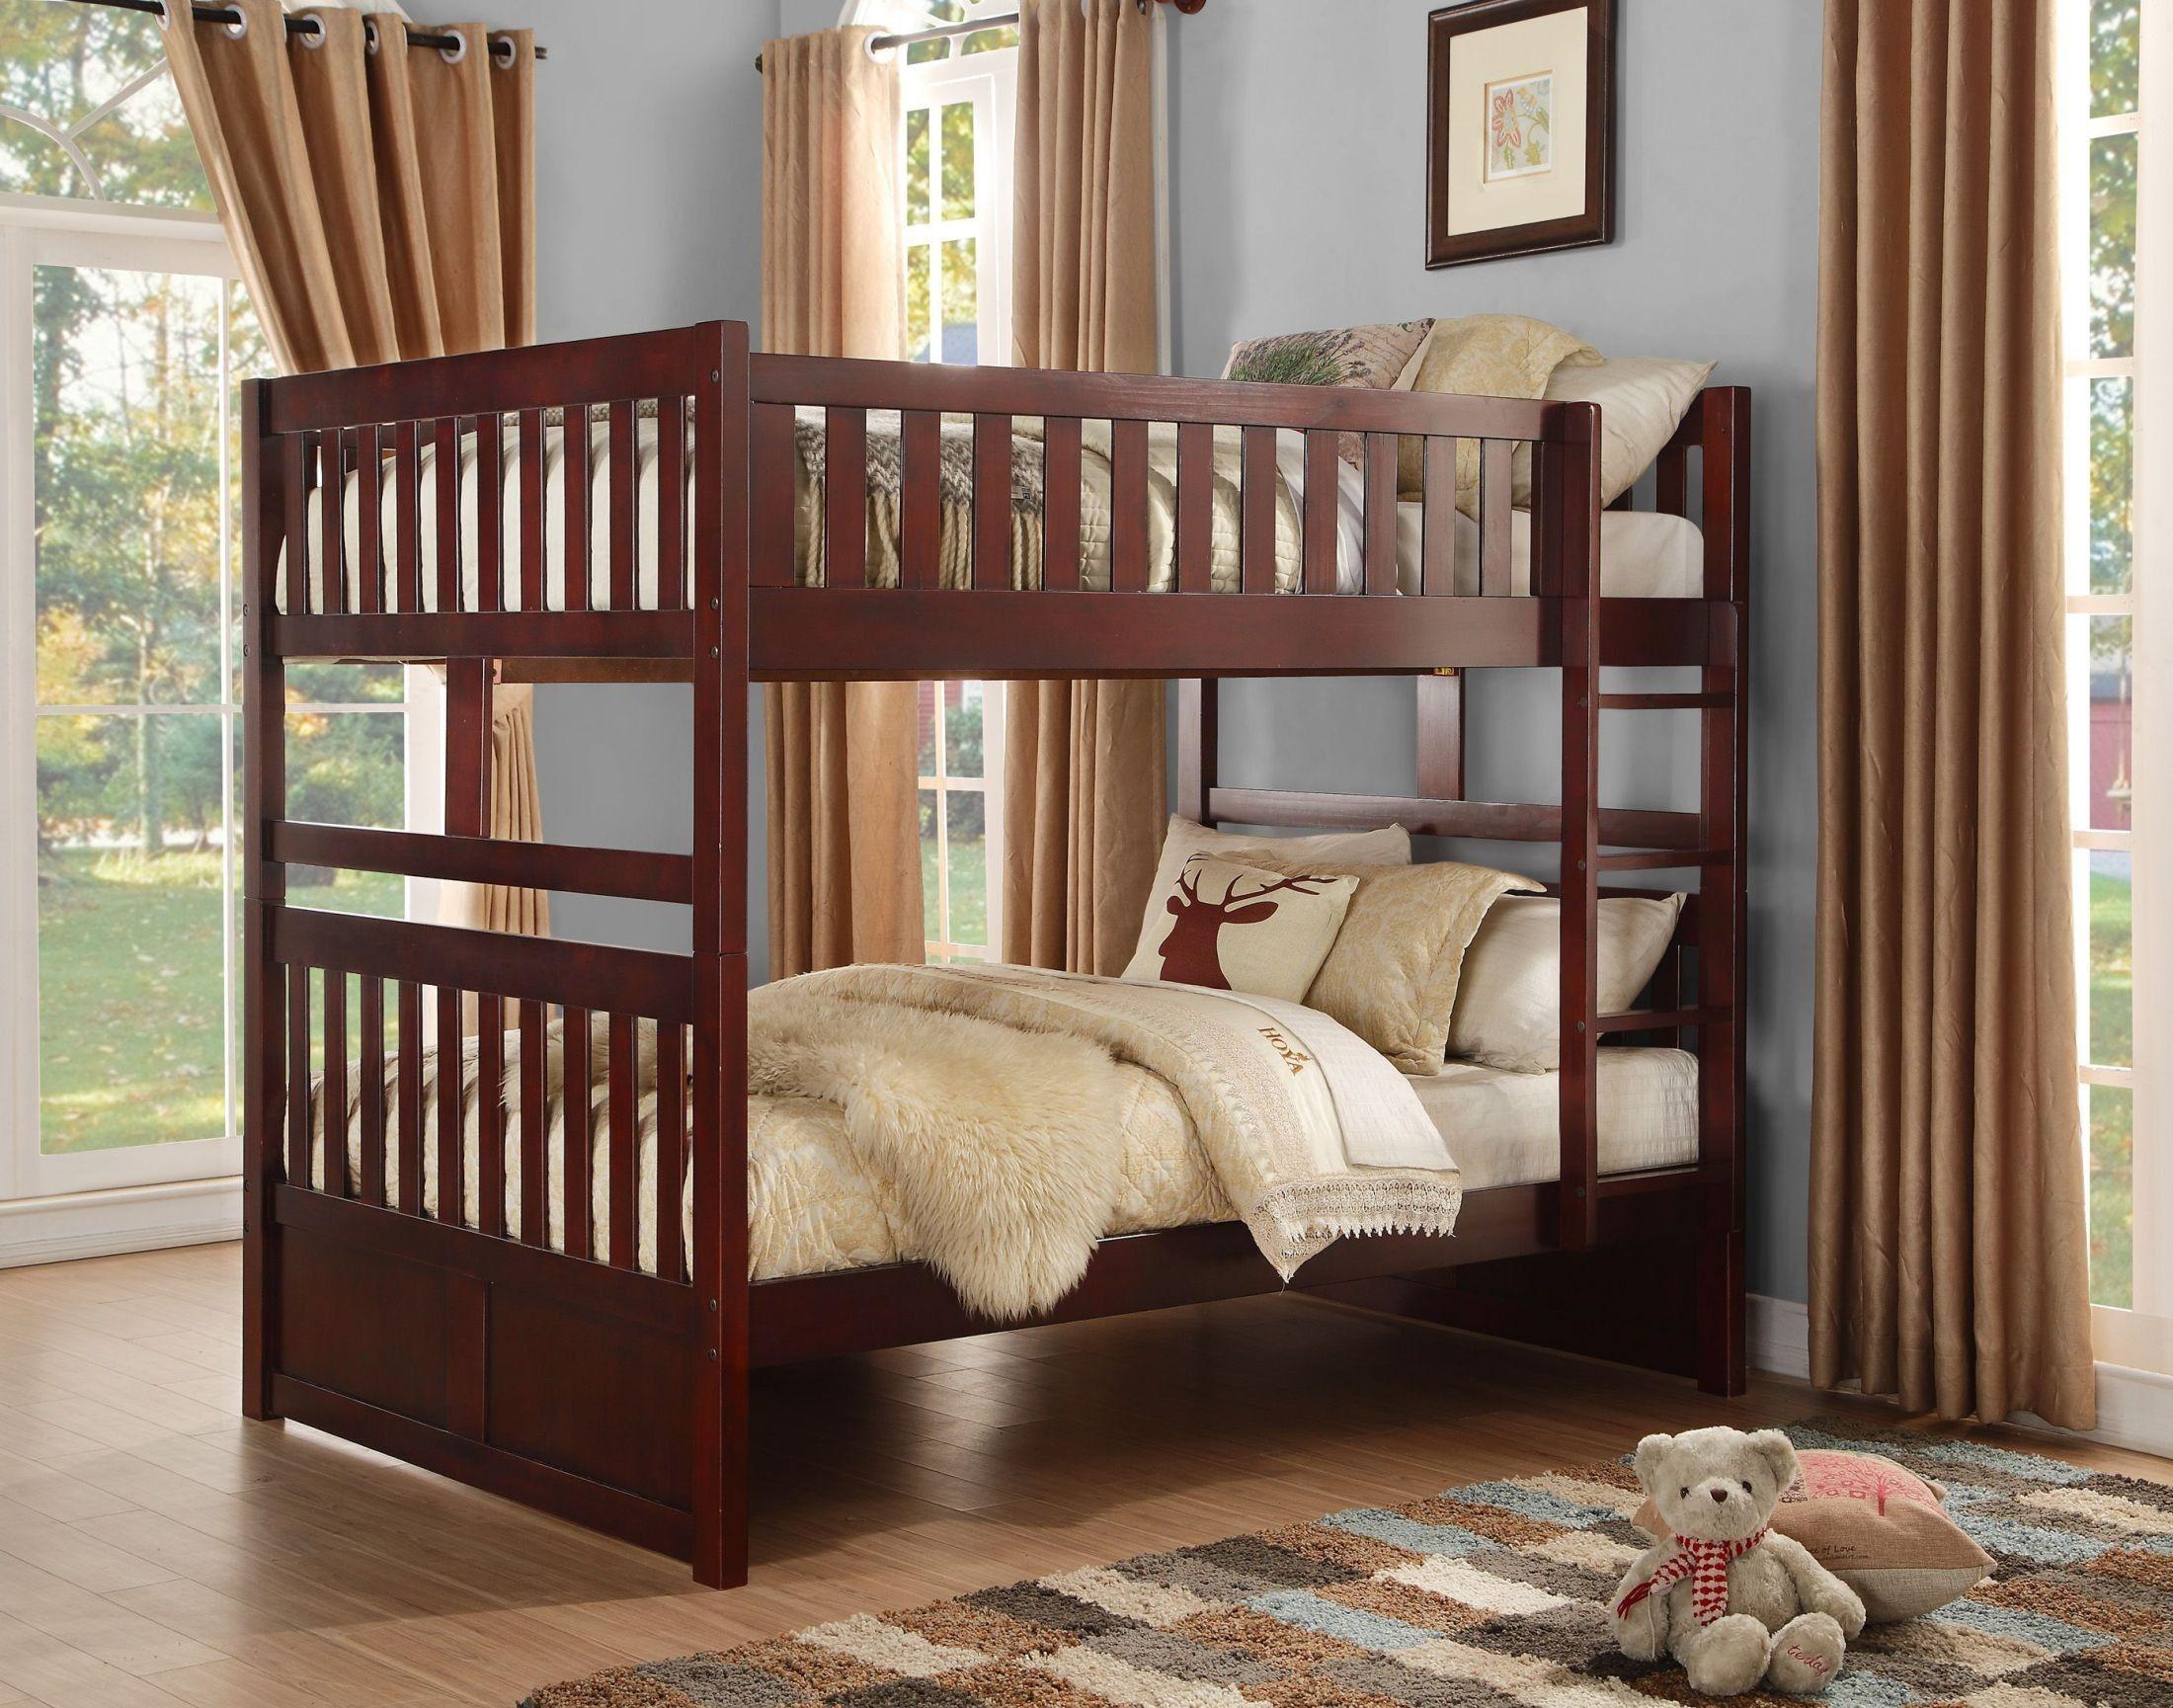 Best Rowe Full Over Full Bunk Bed Bunk Beds Wood Bunk Beds 400 x 300